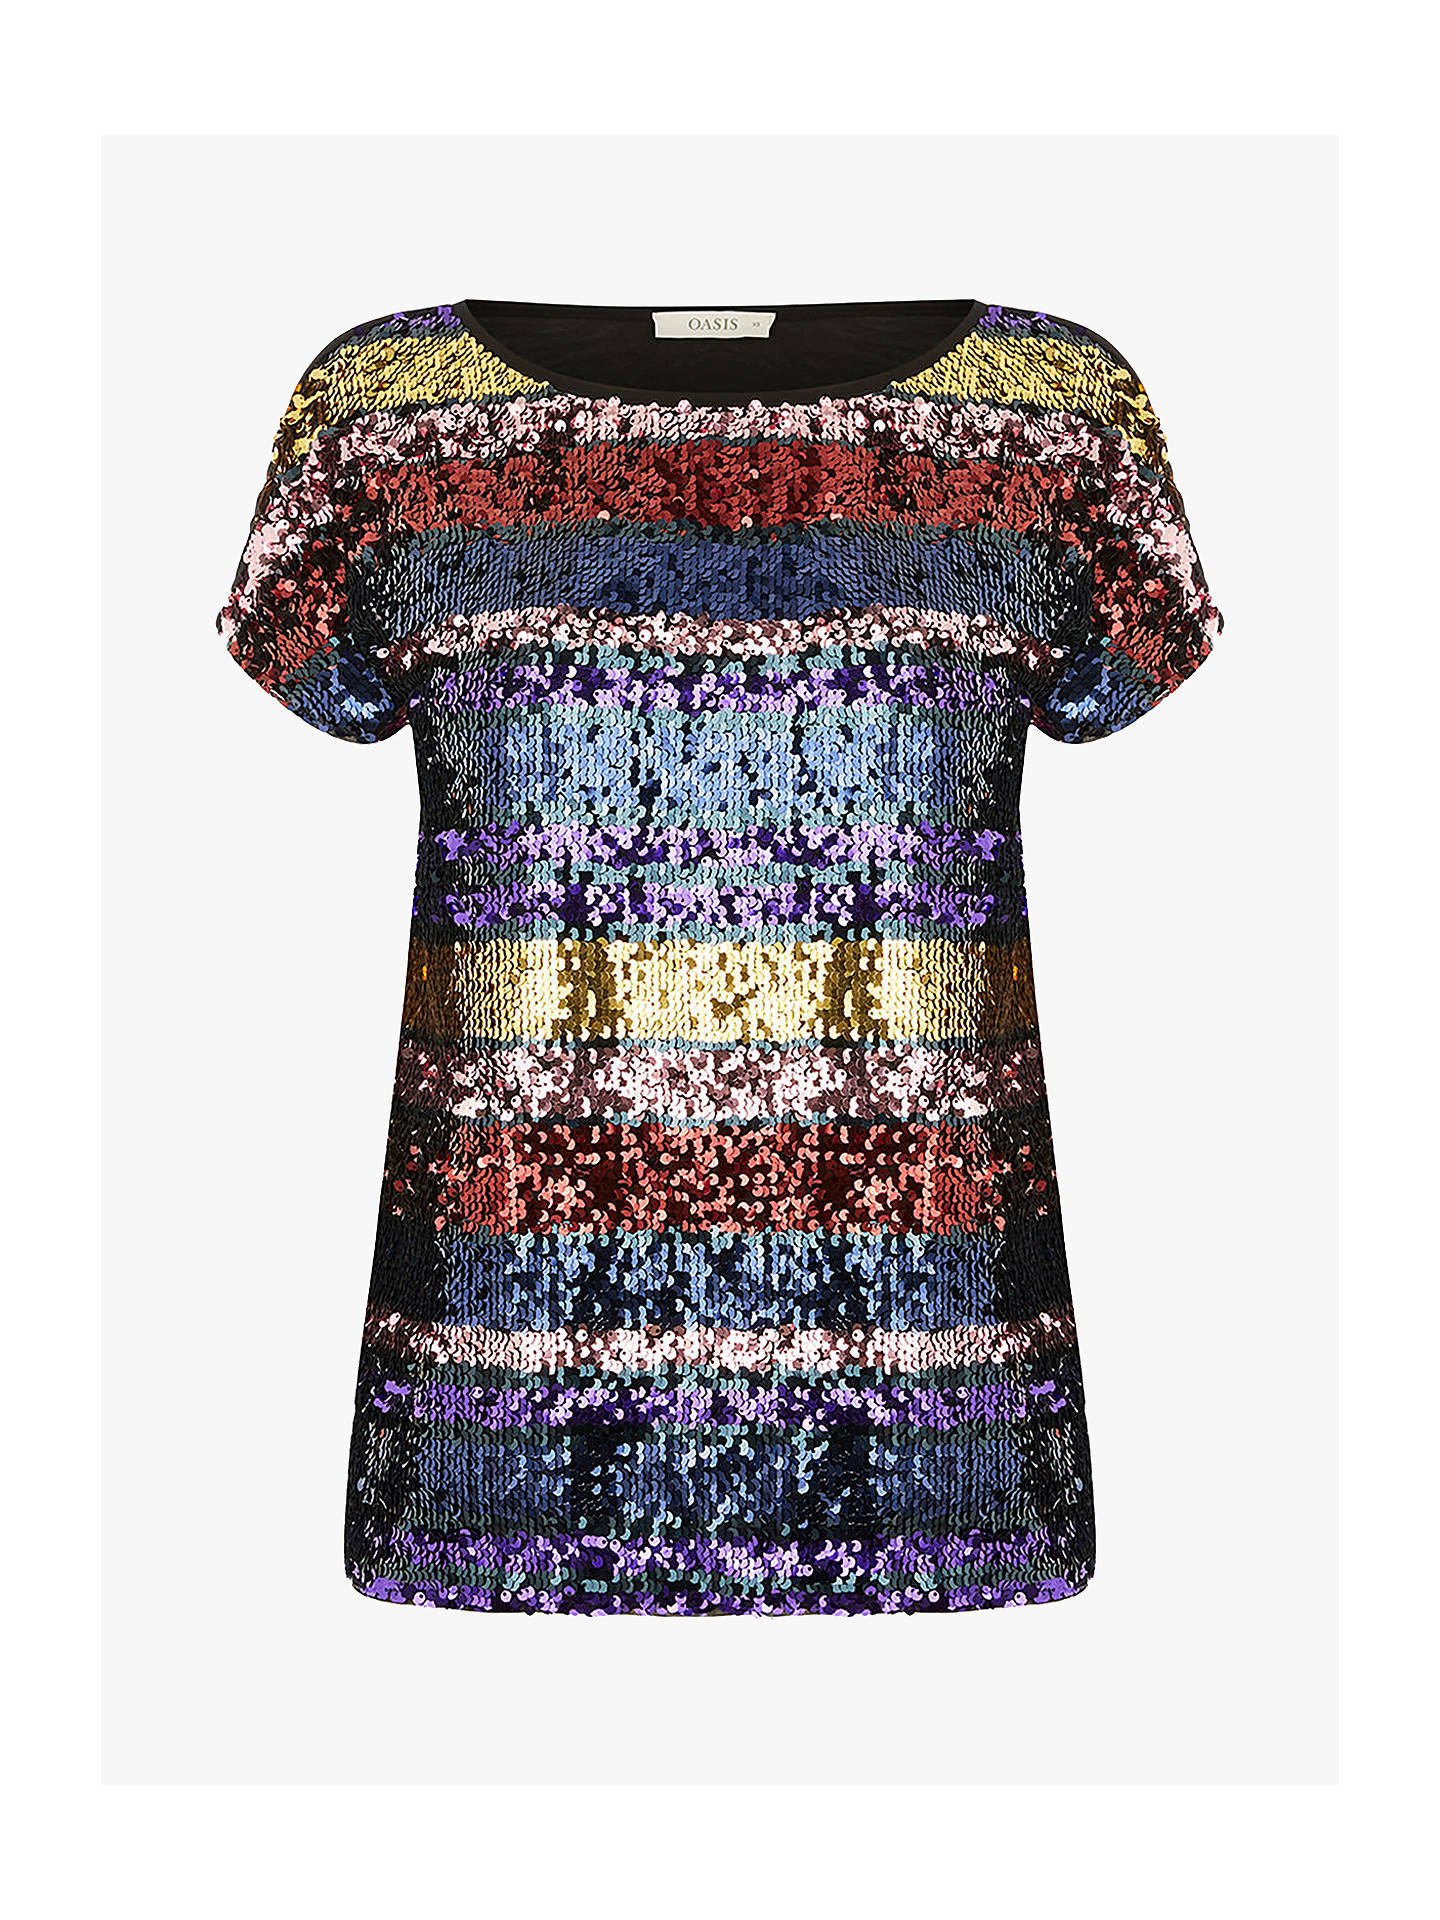 1afc56953200 ... Buy Oasis Rainbow Sequin T-Shirt, Multi, S Online at johnlewis.com ...